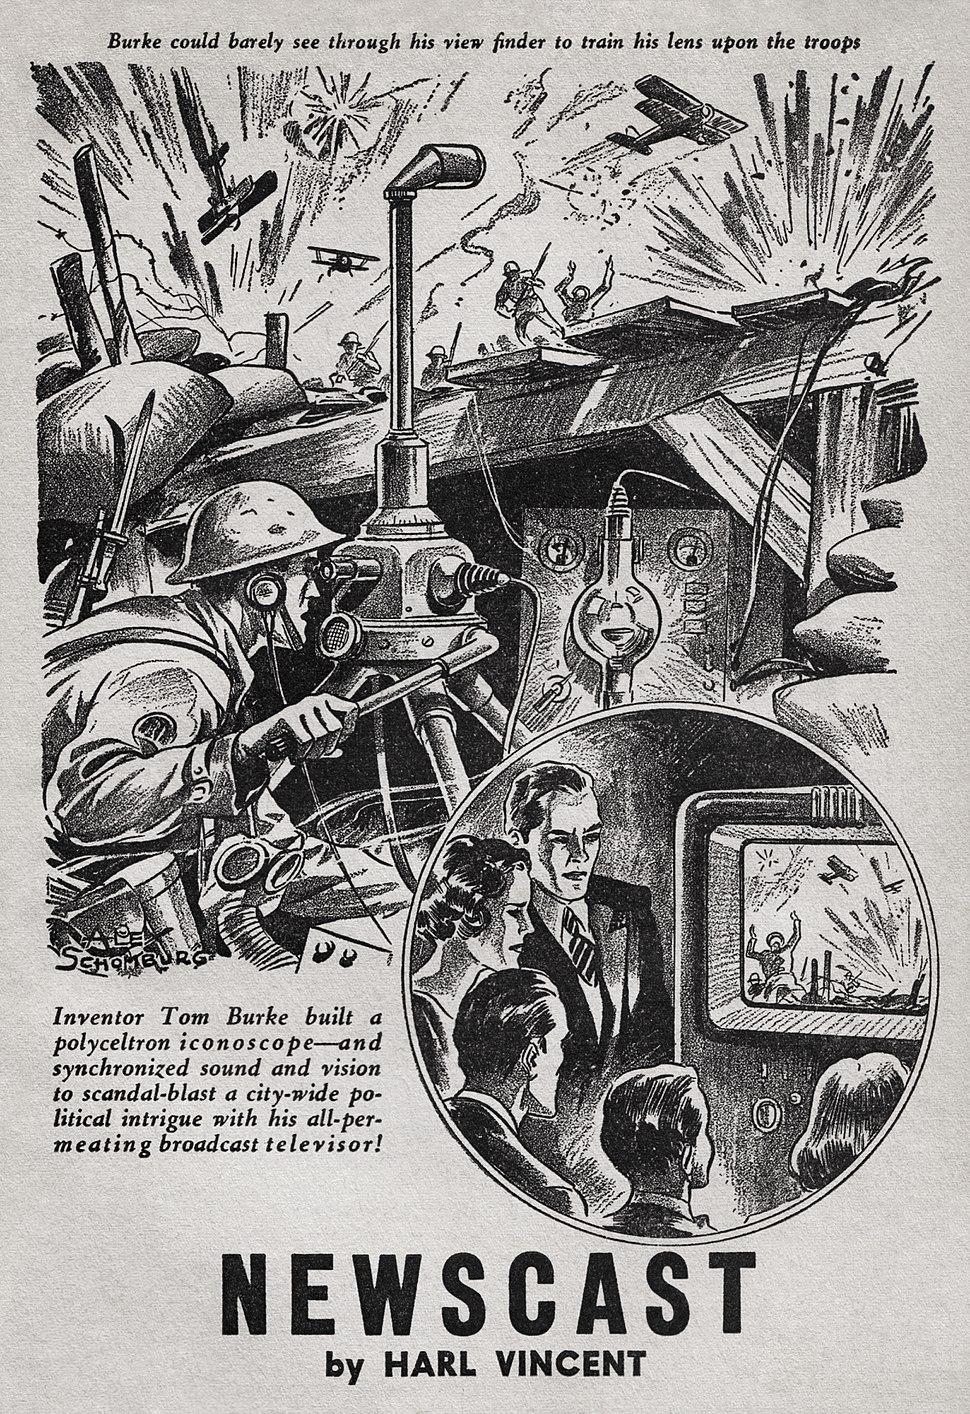 Alex Schomburg - Harl Vincent - Marvel Science Stories for April-May 1939 - Illustration for Newscast